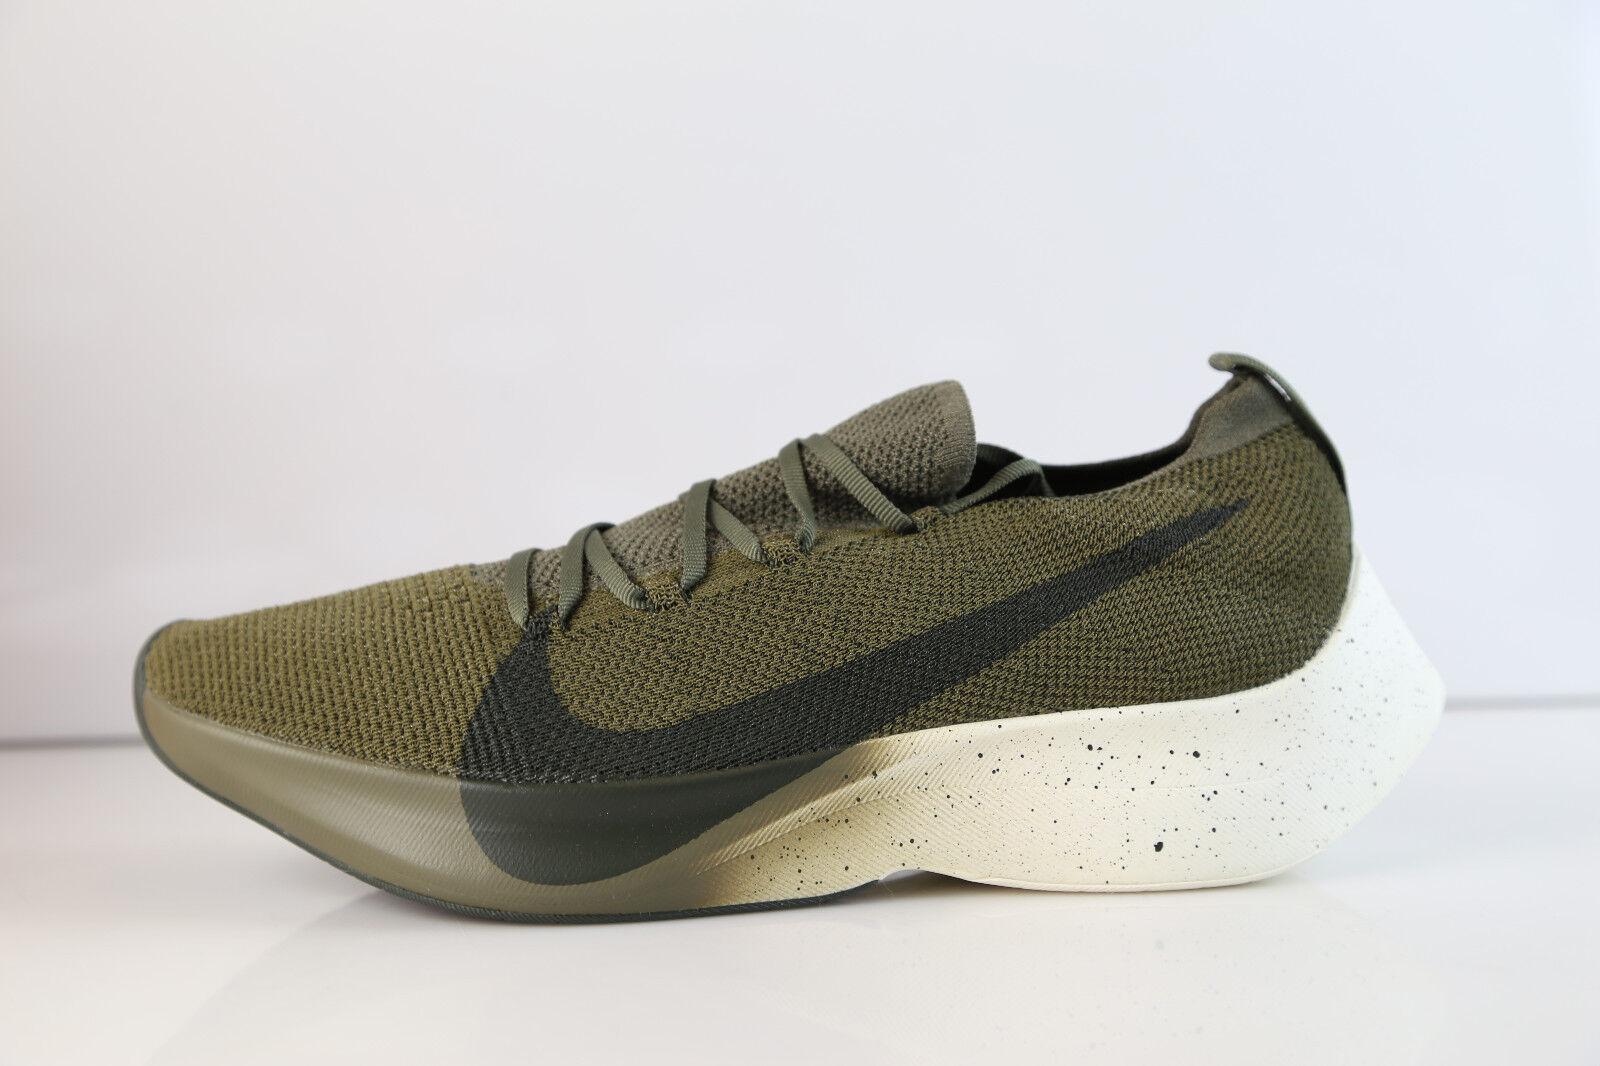 Nike Vapor Street Elite Flyknit Medium Olive Sequoia AQ1763-2018 8-13 fk air Brand discount